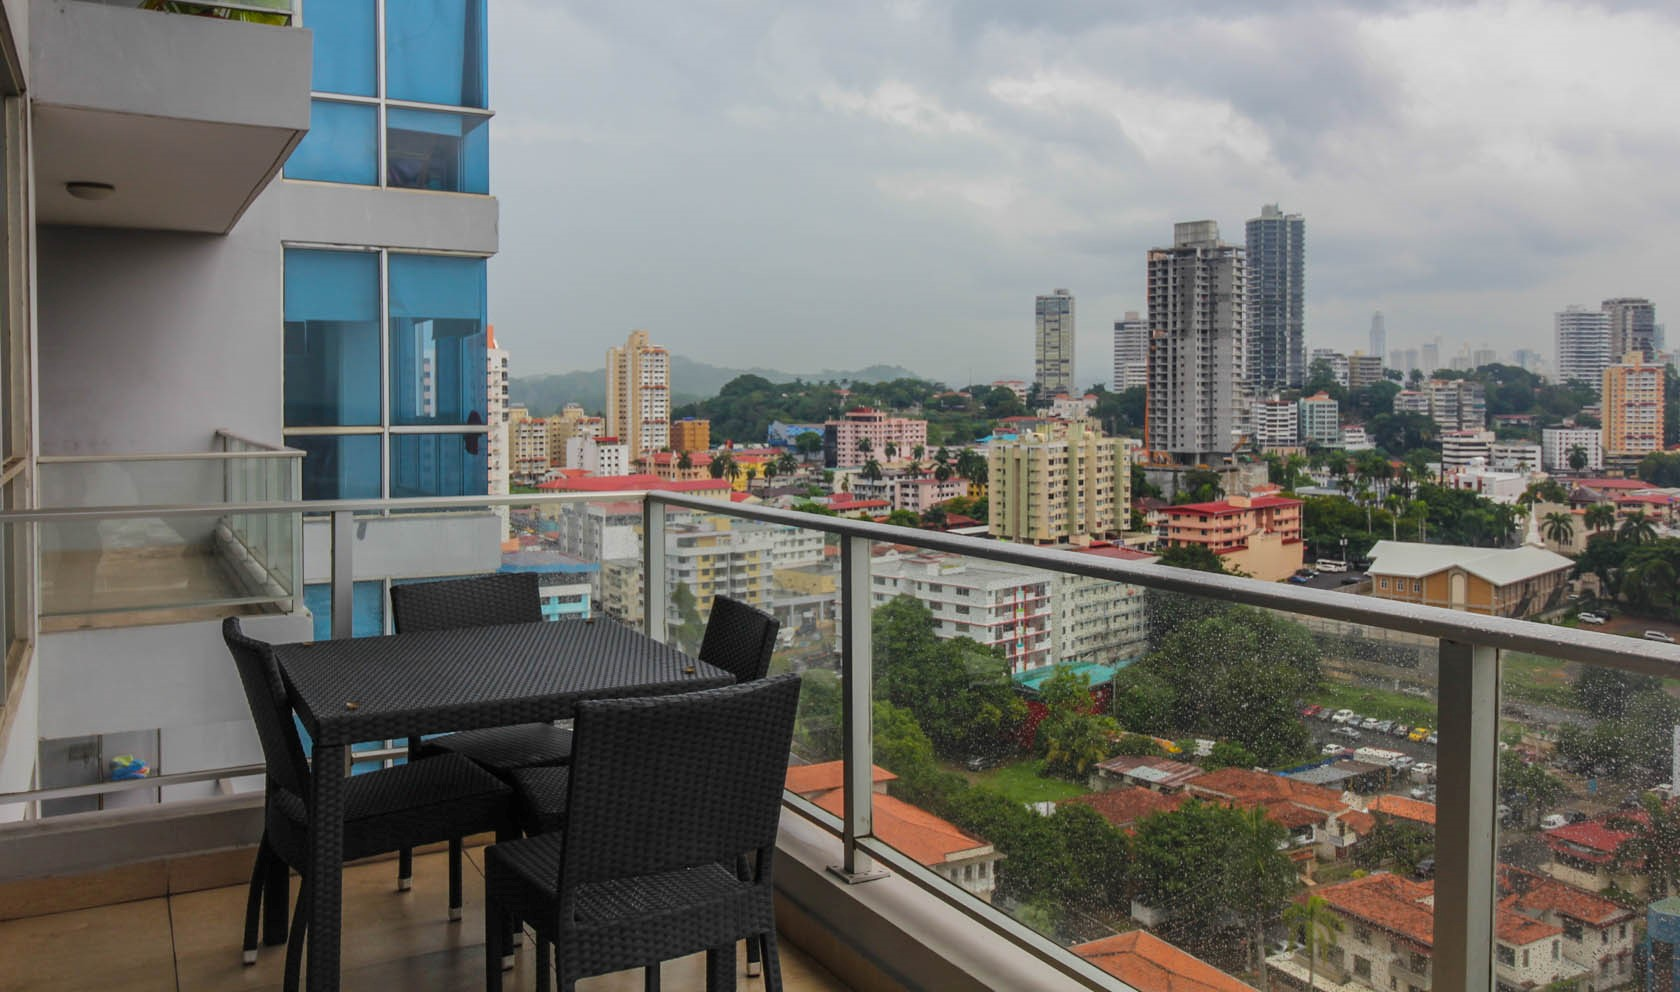 Avenida-Balboa-Panama-property-panamaequityocean-city-views-2nd-line-balboa-ave-4.jpg